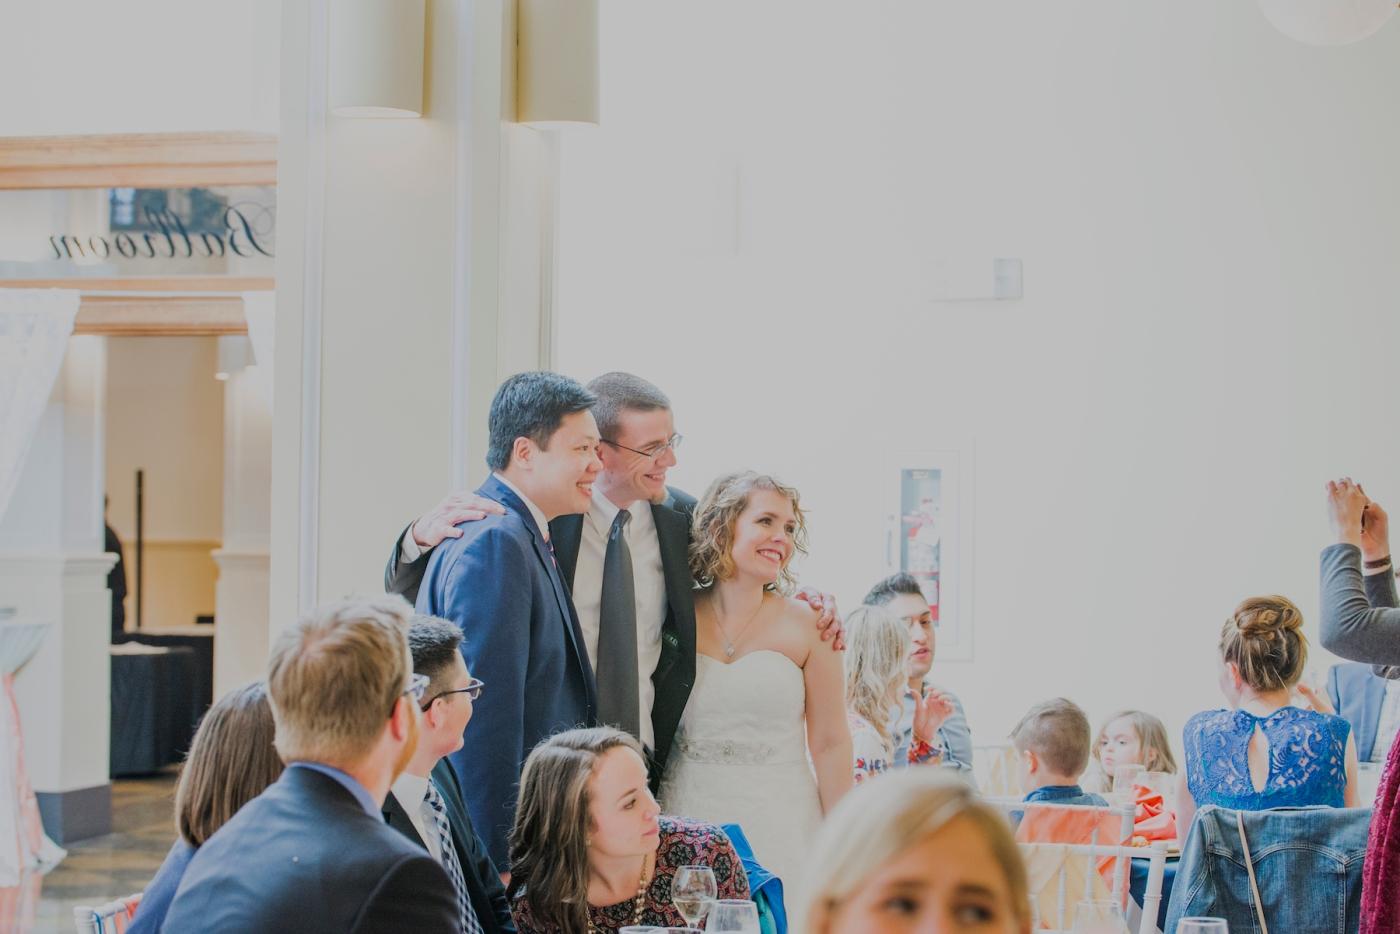 DSC_3202Everett_Wedding_Ballroom_Jane_Speleers_photography_Rachel_and_Edmund_reception_2017